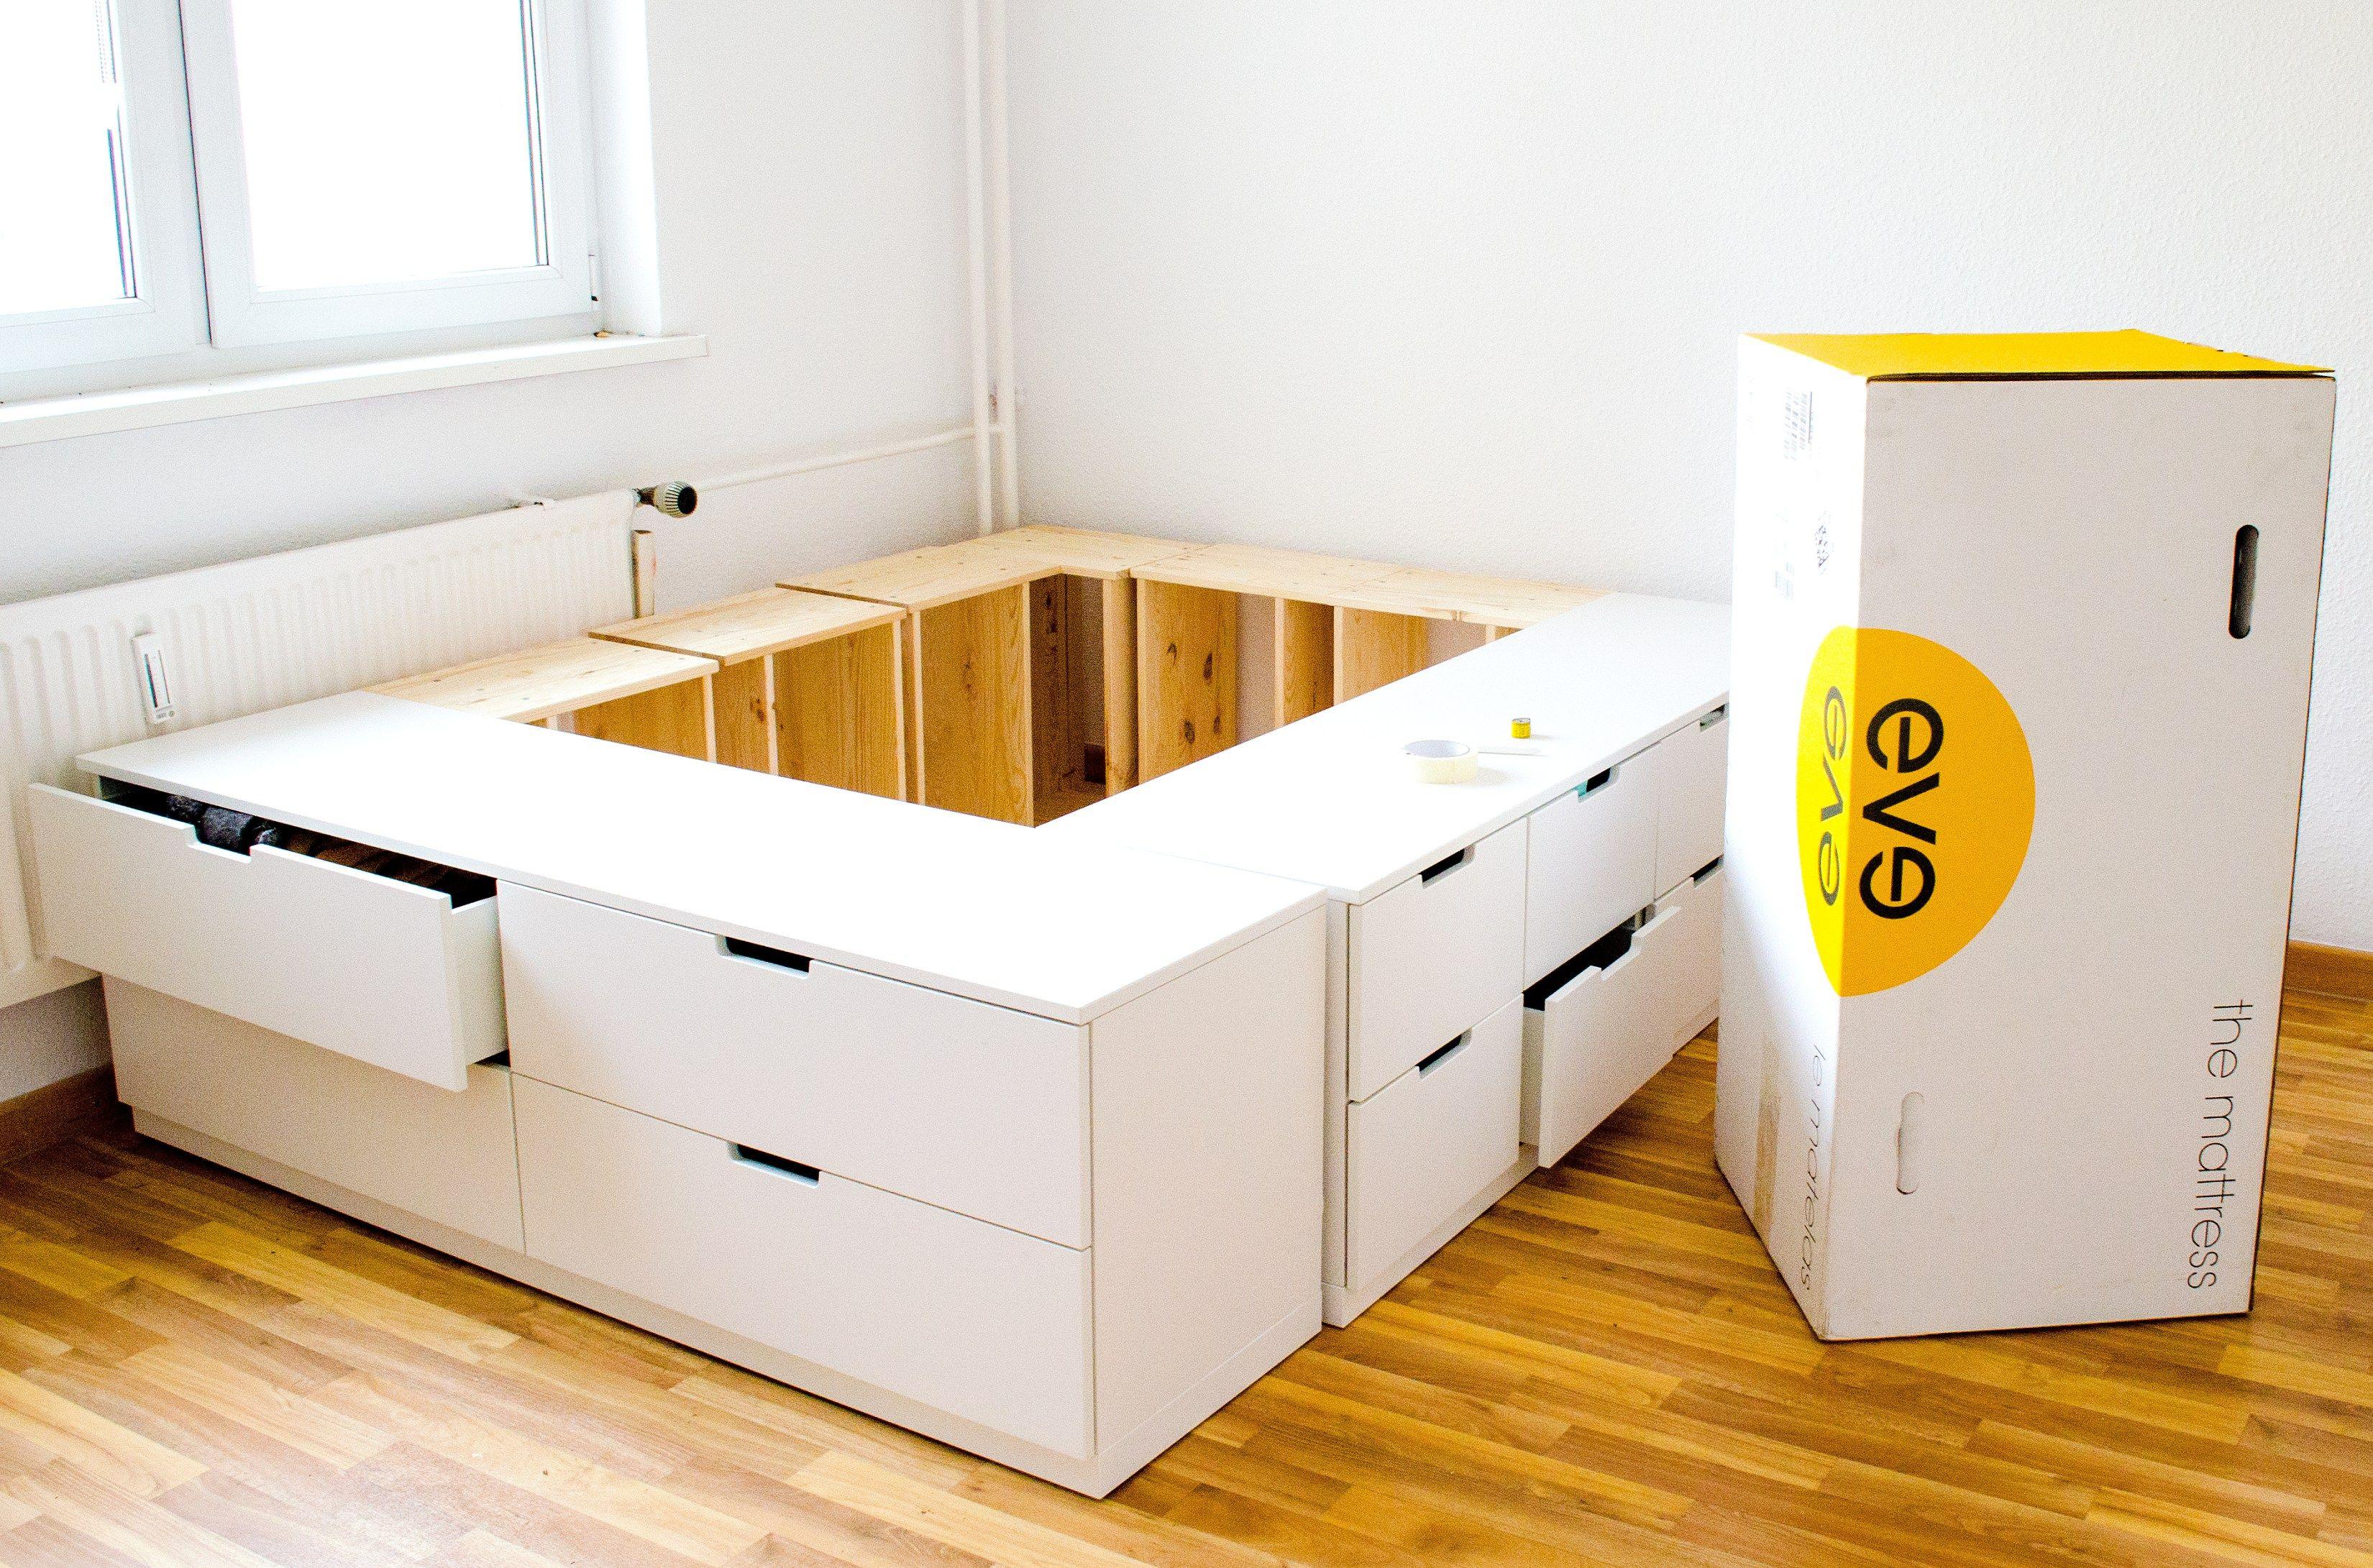 DIY IKEA HACk - Plattform-Bett selber bauen aus Ikea